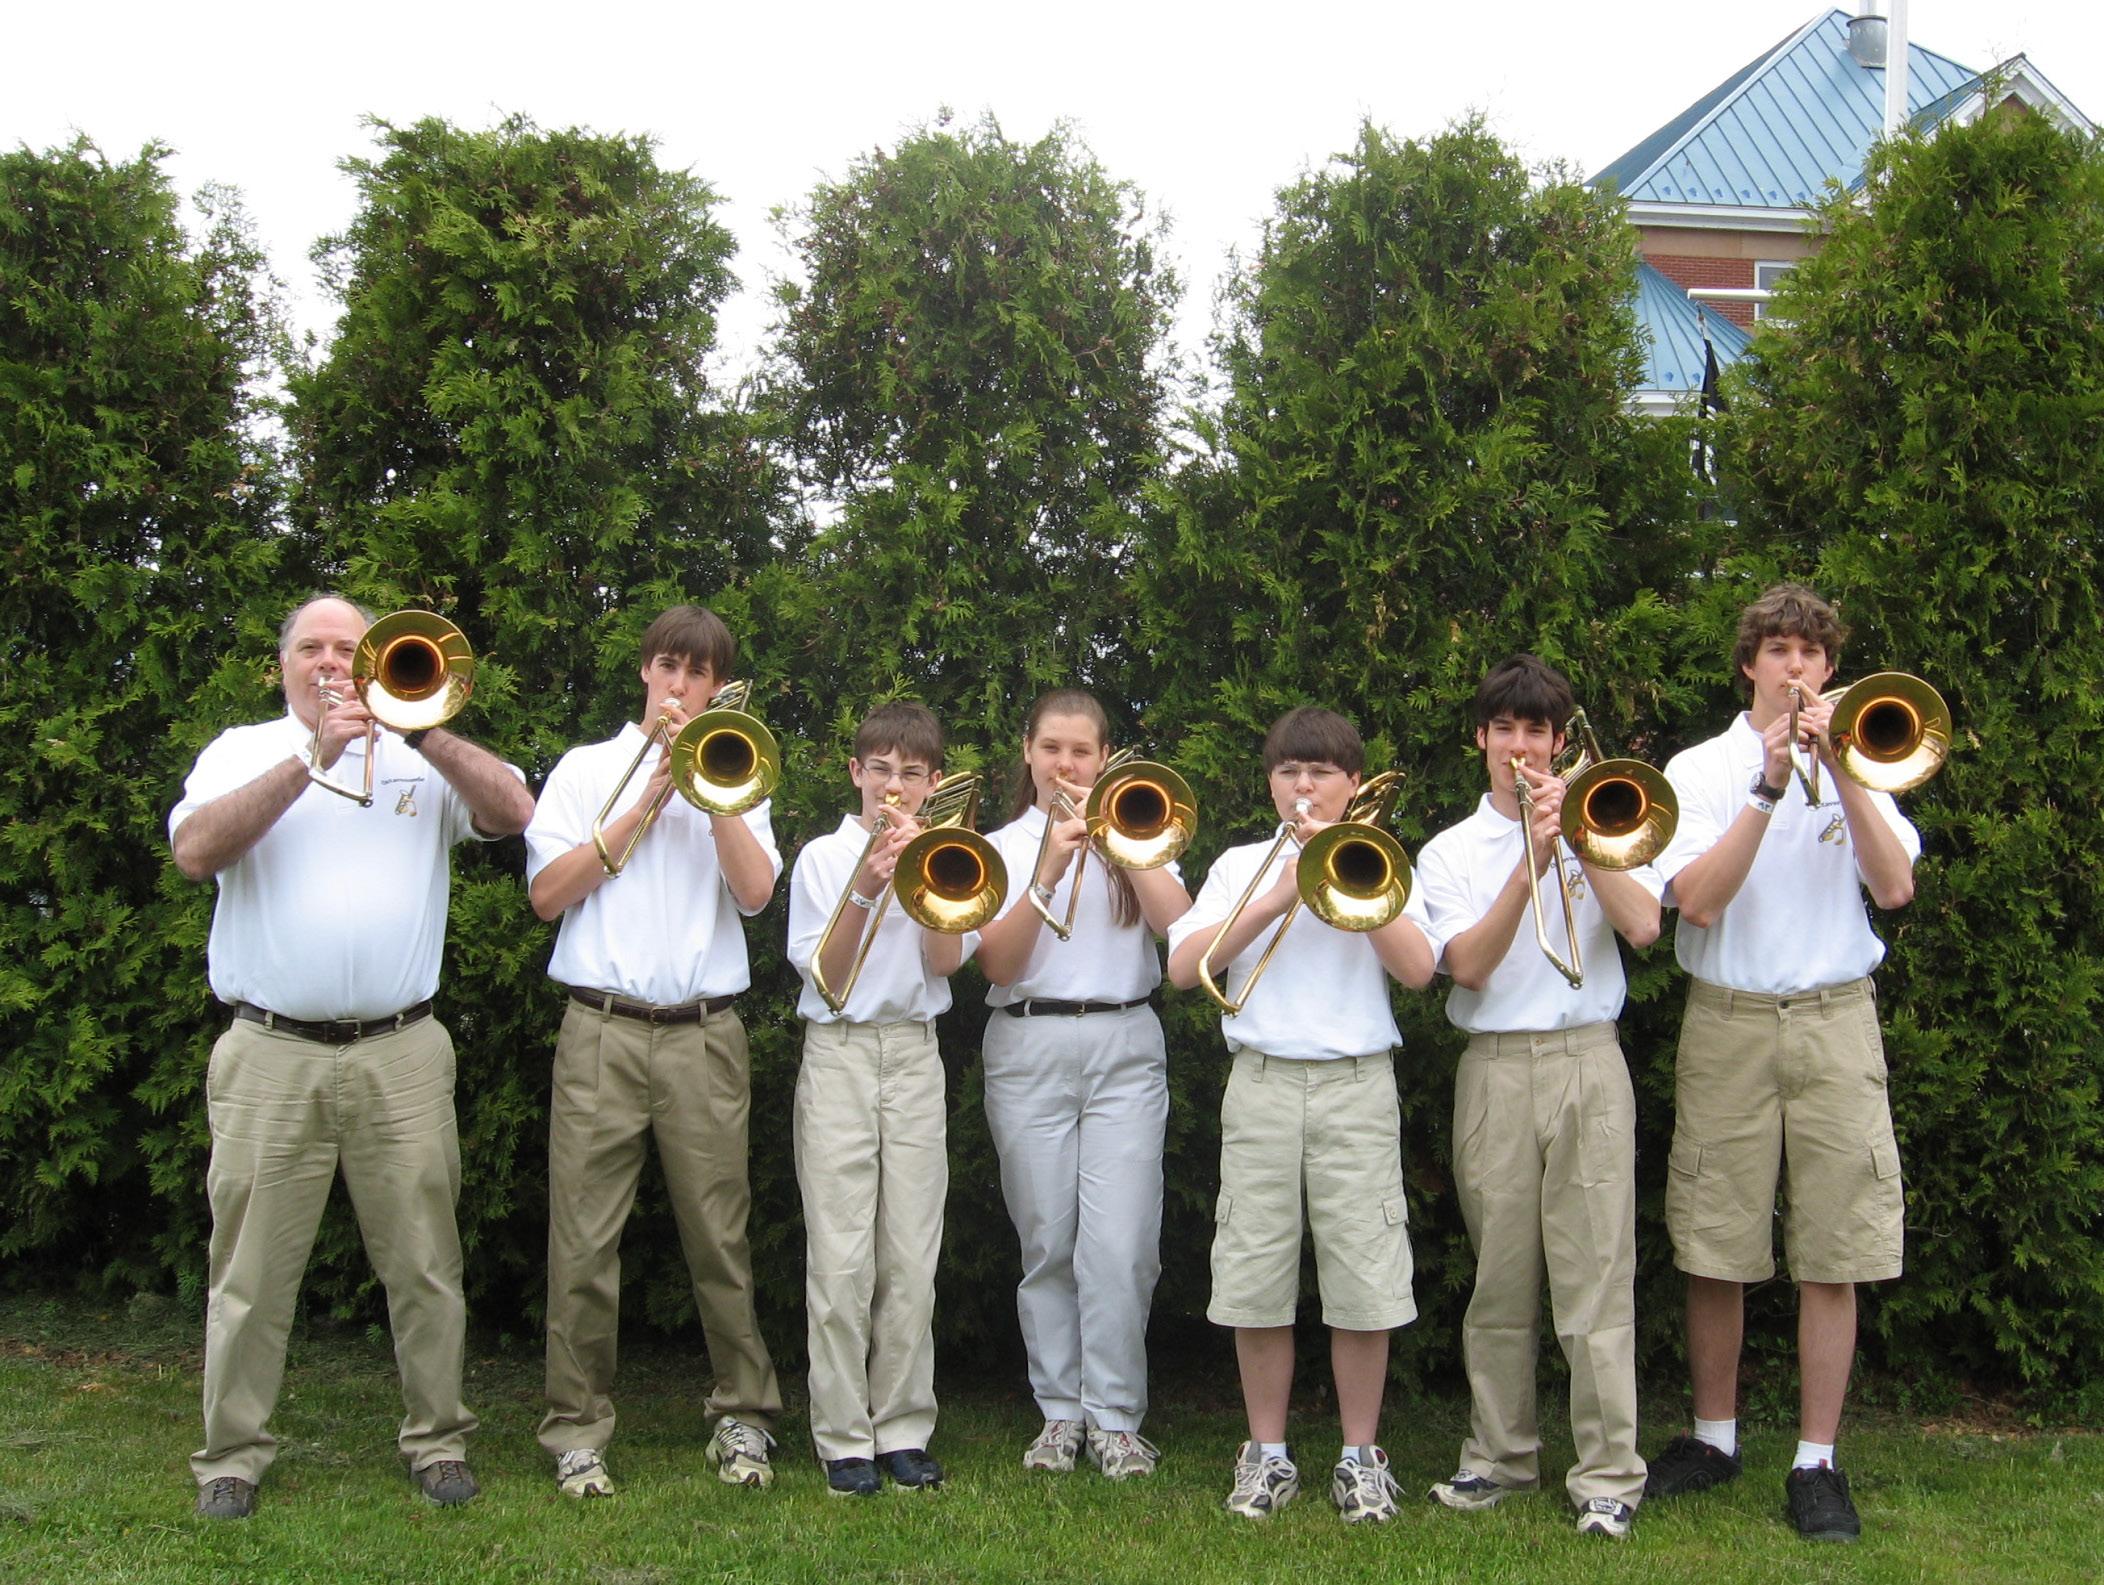 Trombone Choir 2007-05-19 019_edited